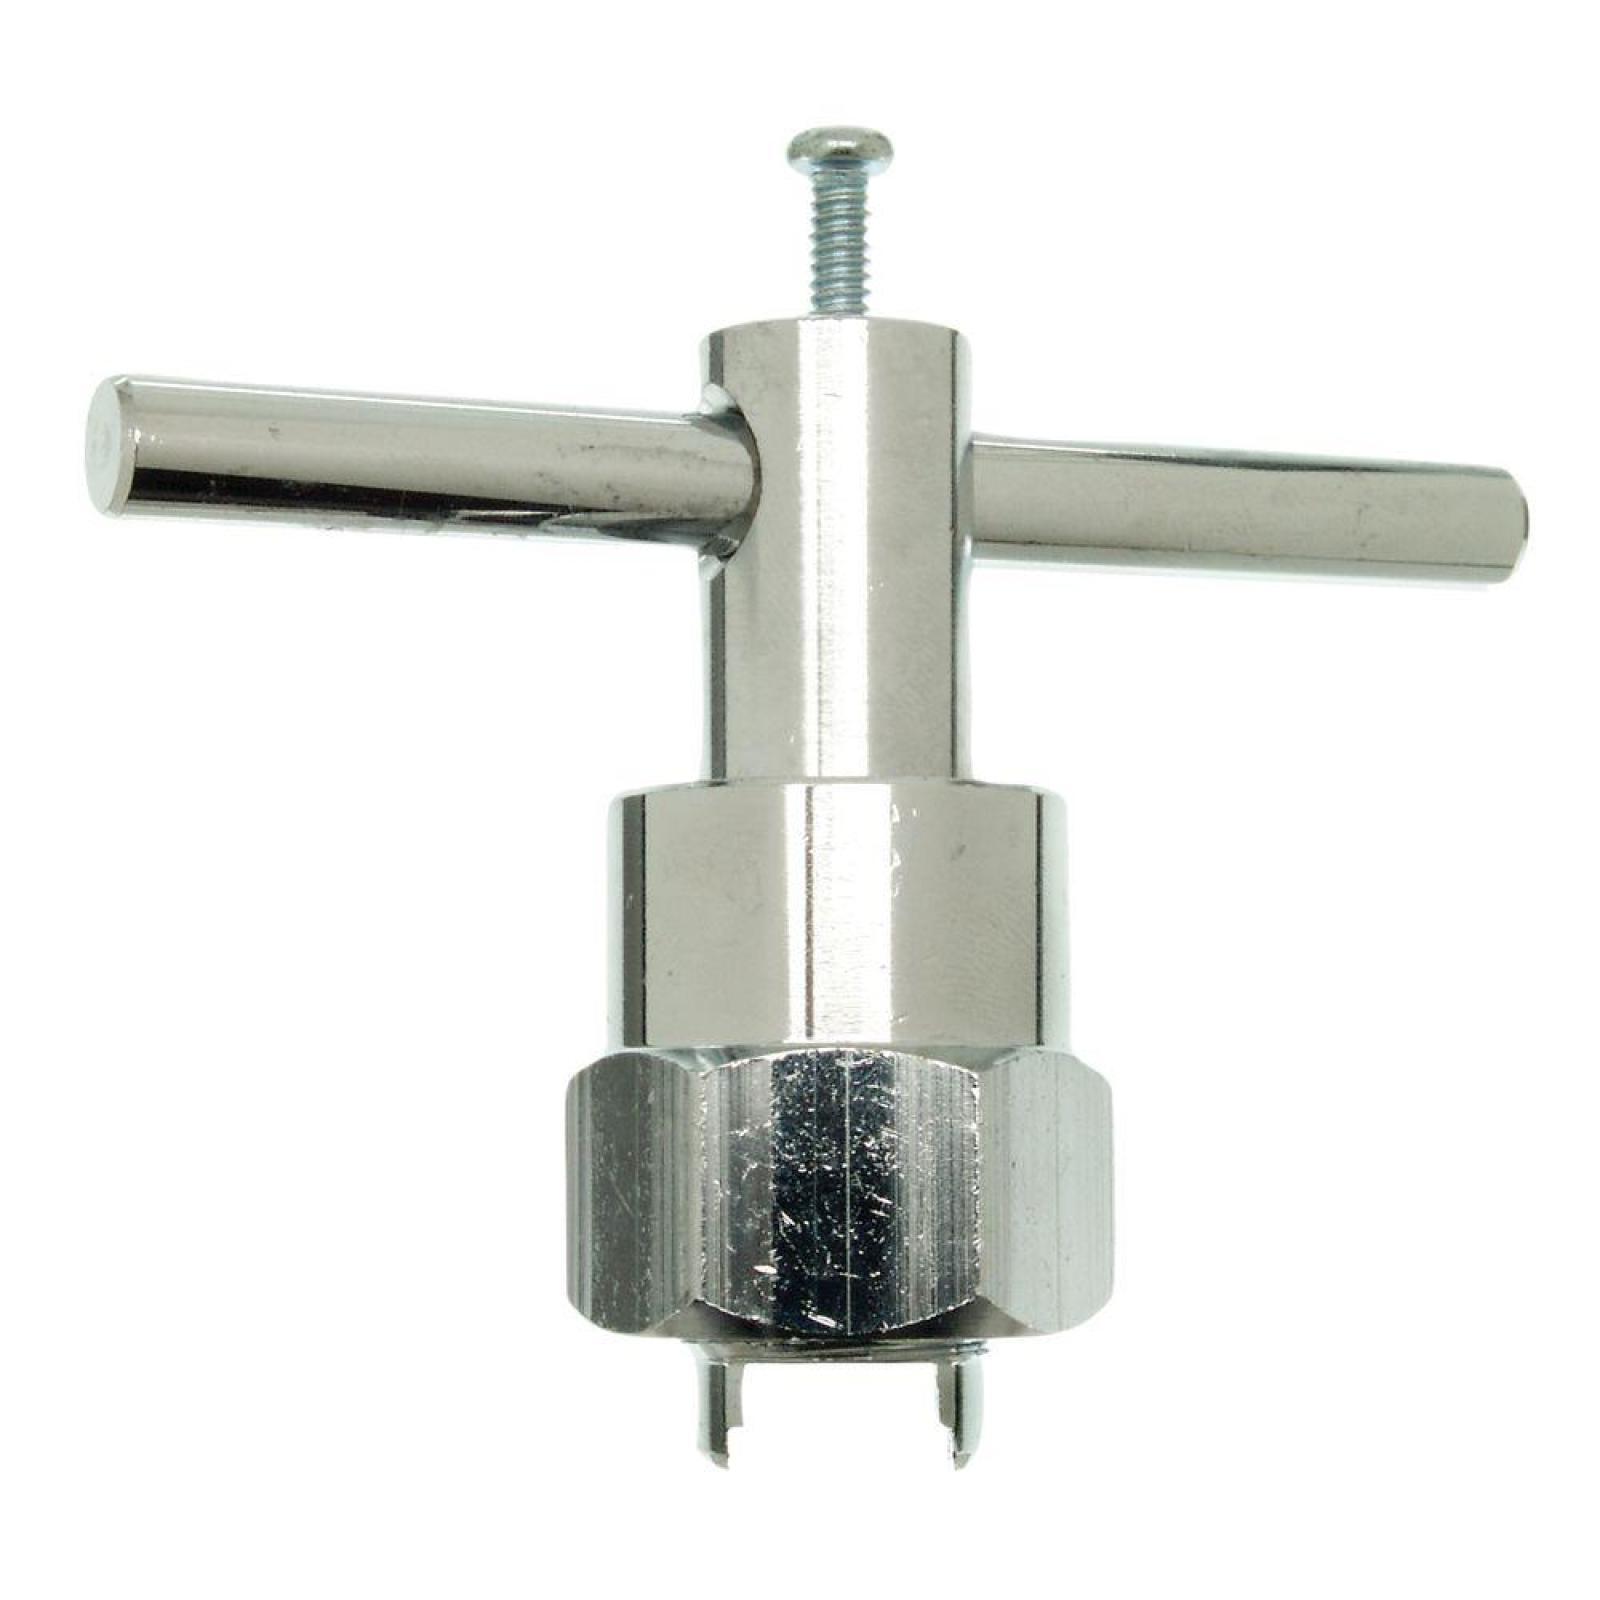 Danco Moen Cartridge Puller Removal Tool Bathroom Sink Tub Plumbing Durable New For Sale Online